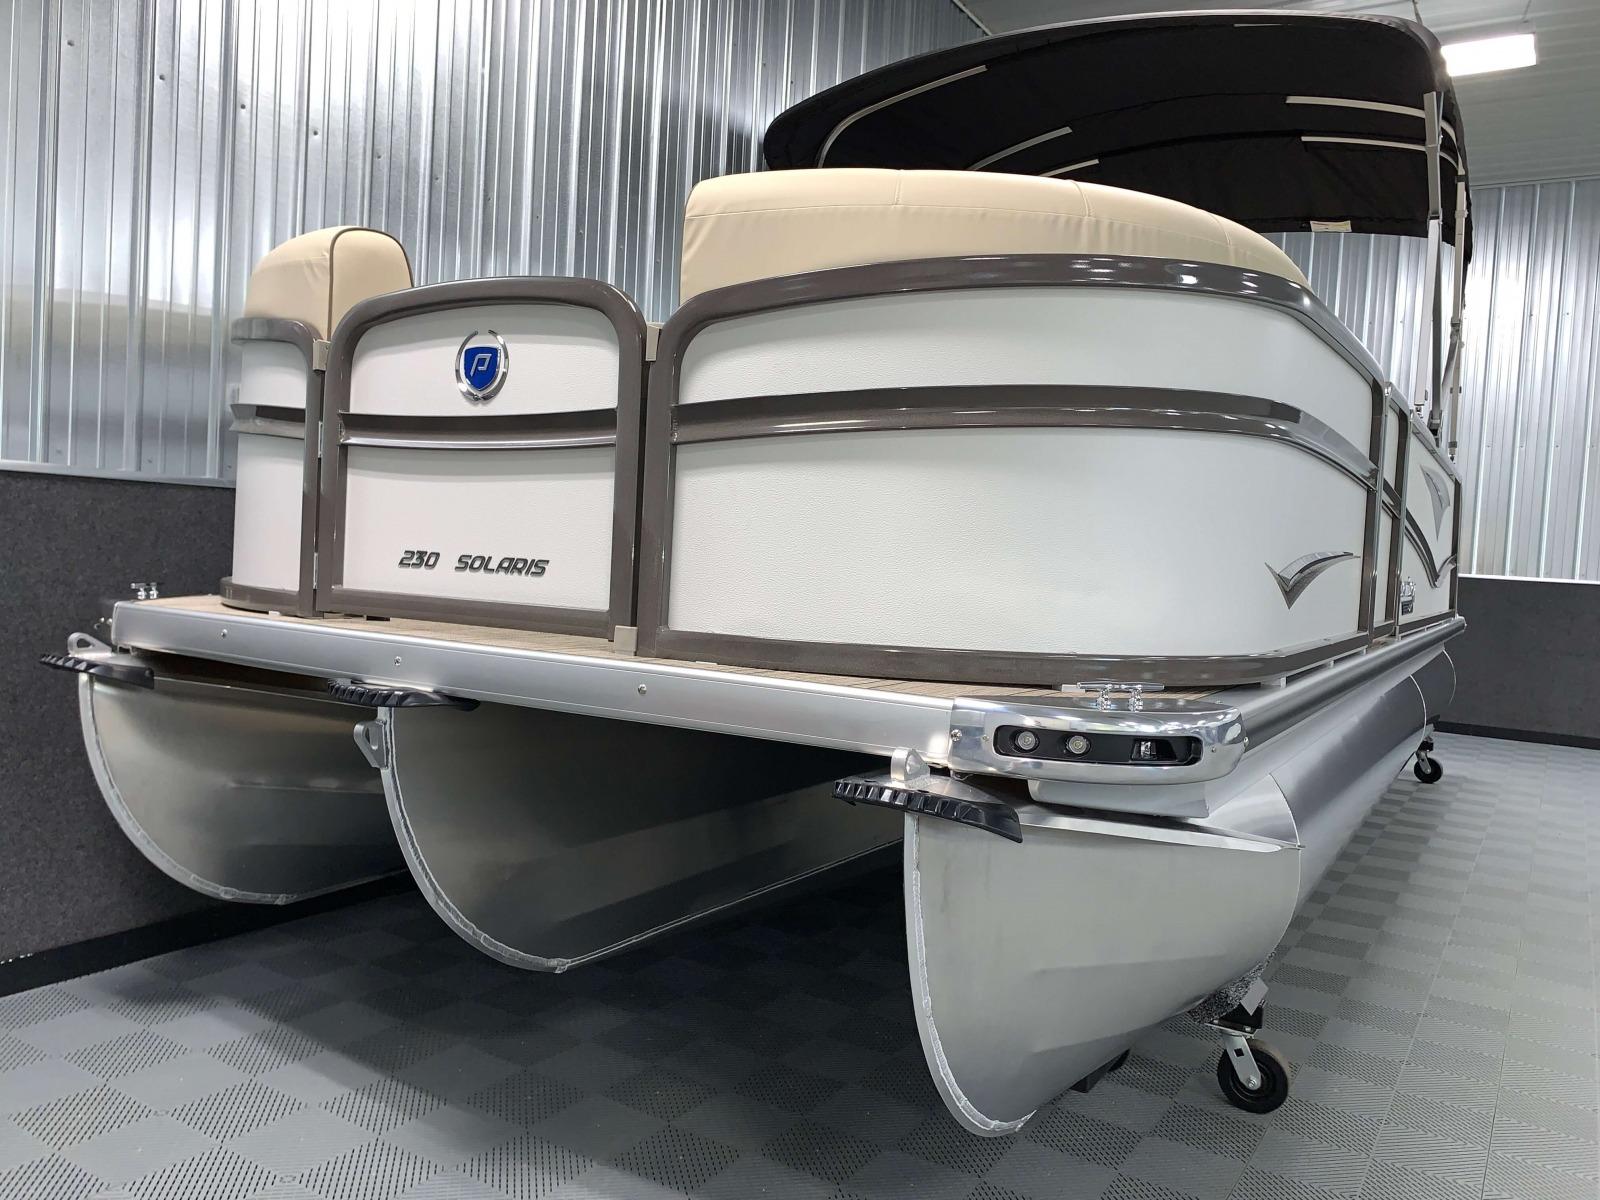 White Panel Color on the 2021 Premier 230 Solaris RL Tritoon Boat